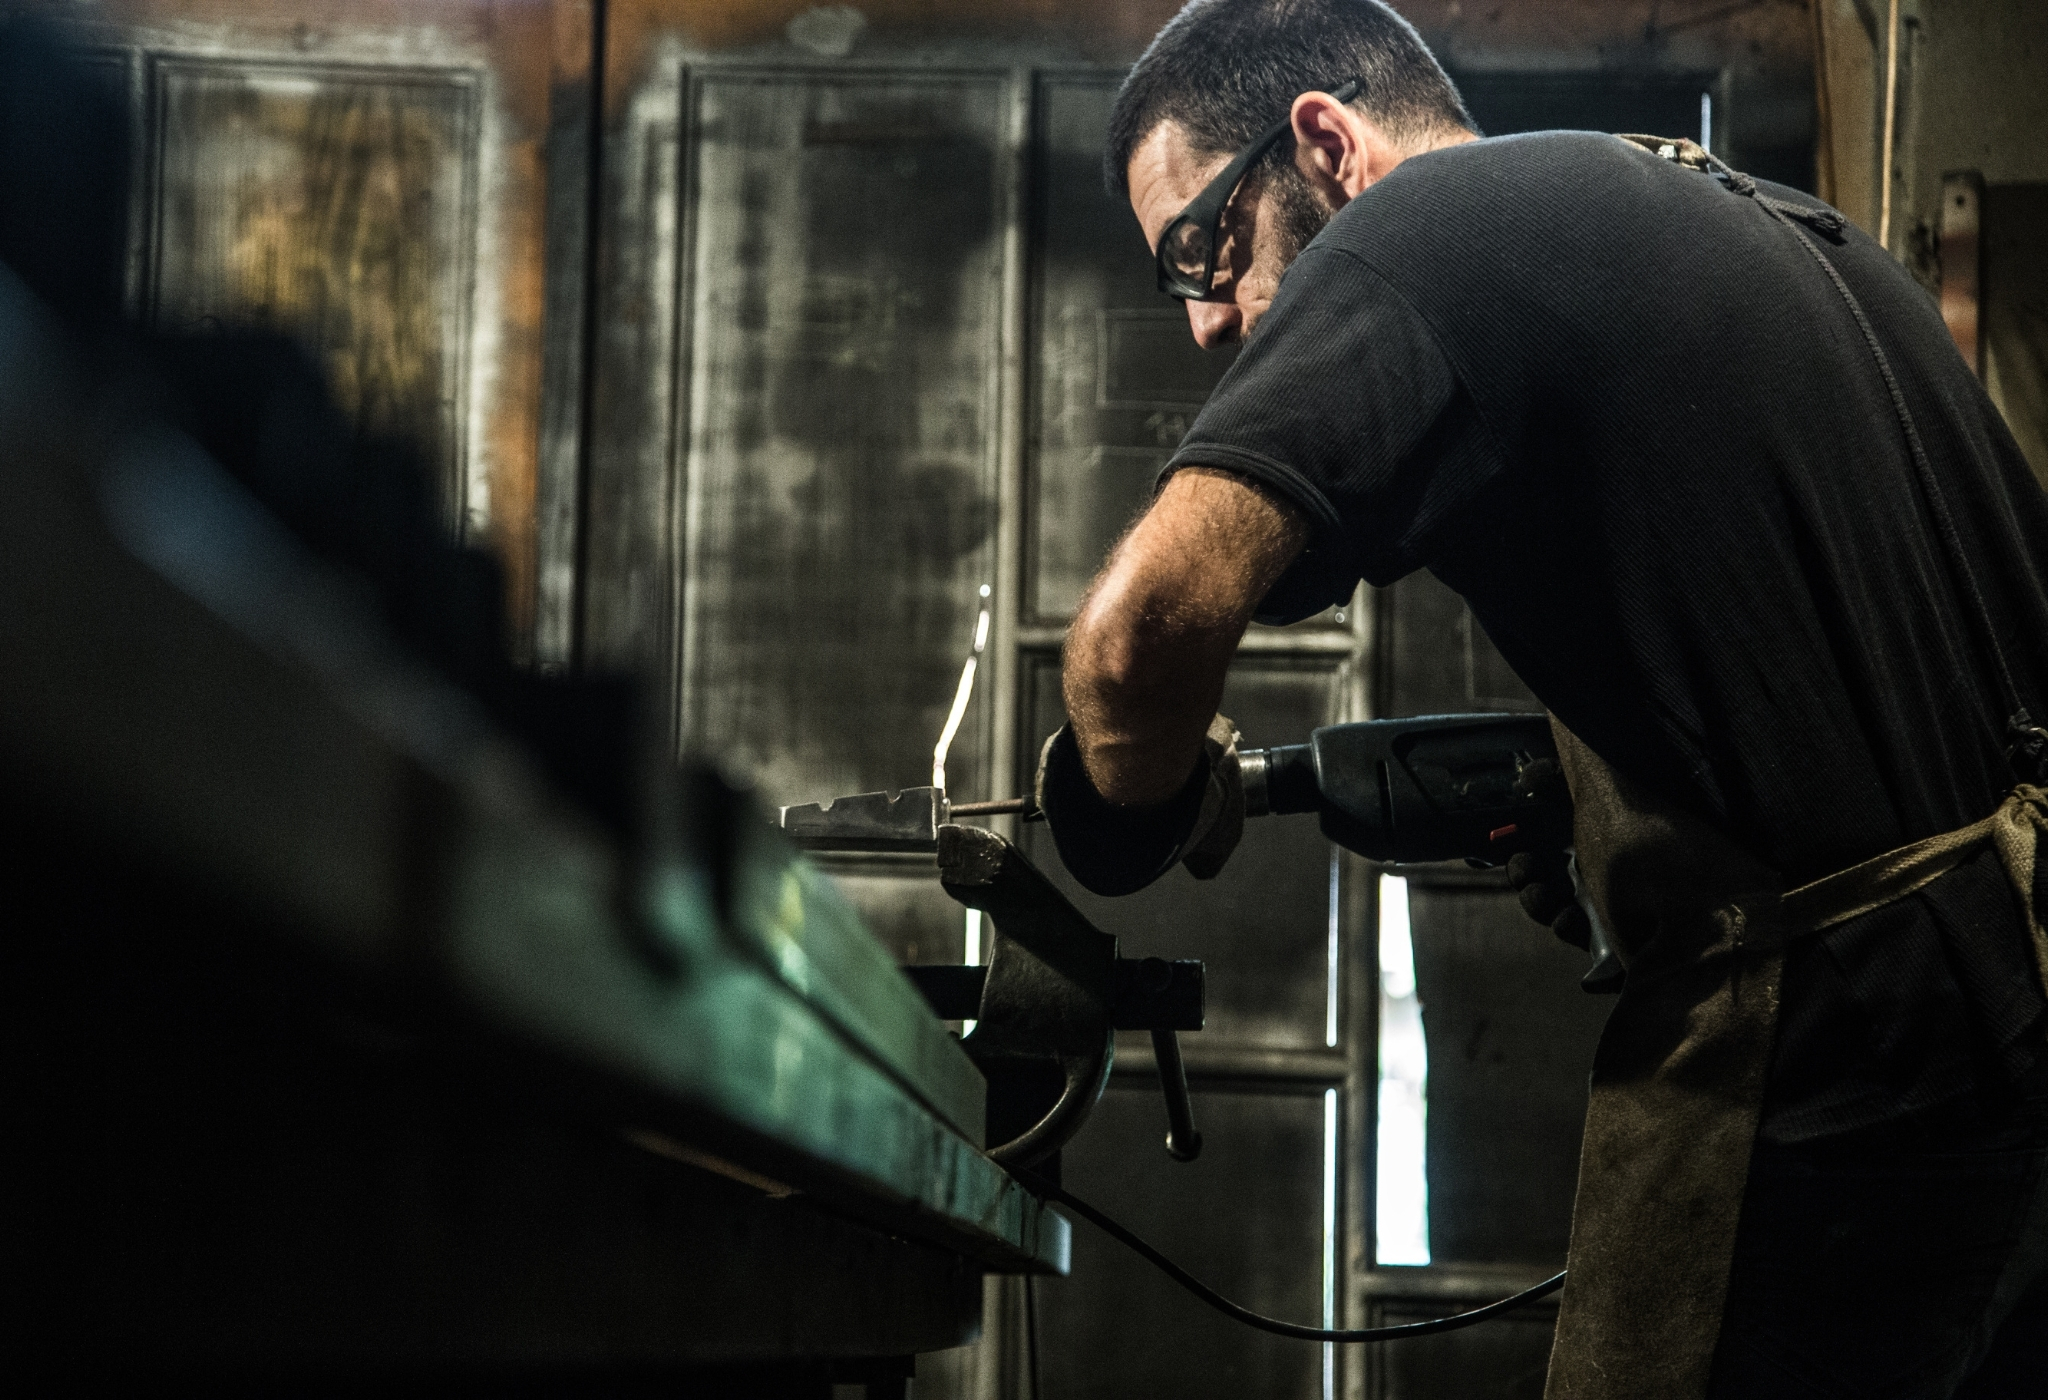 man working hard with manual tools